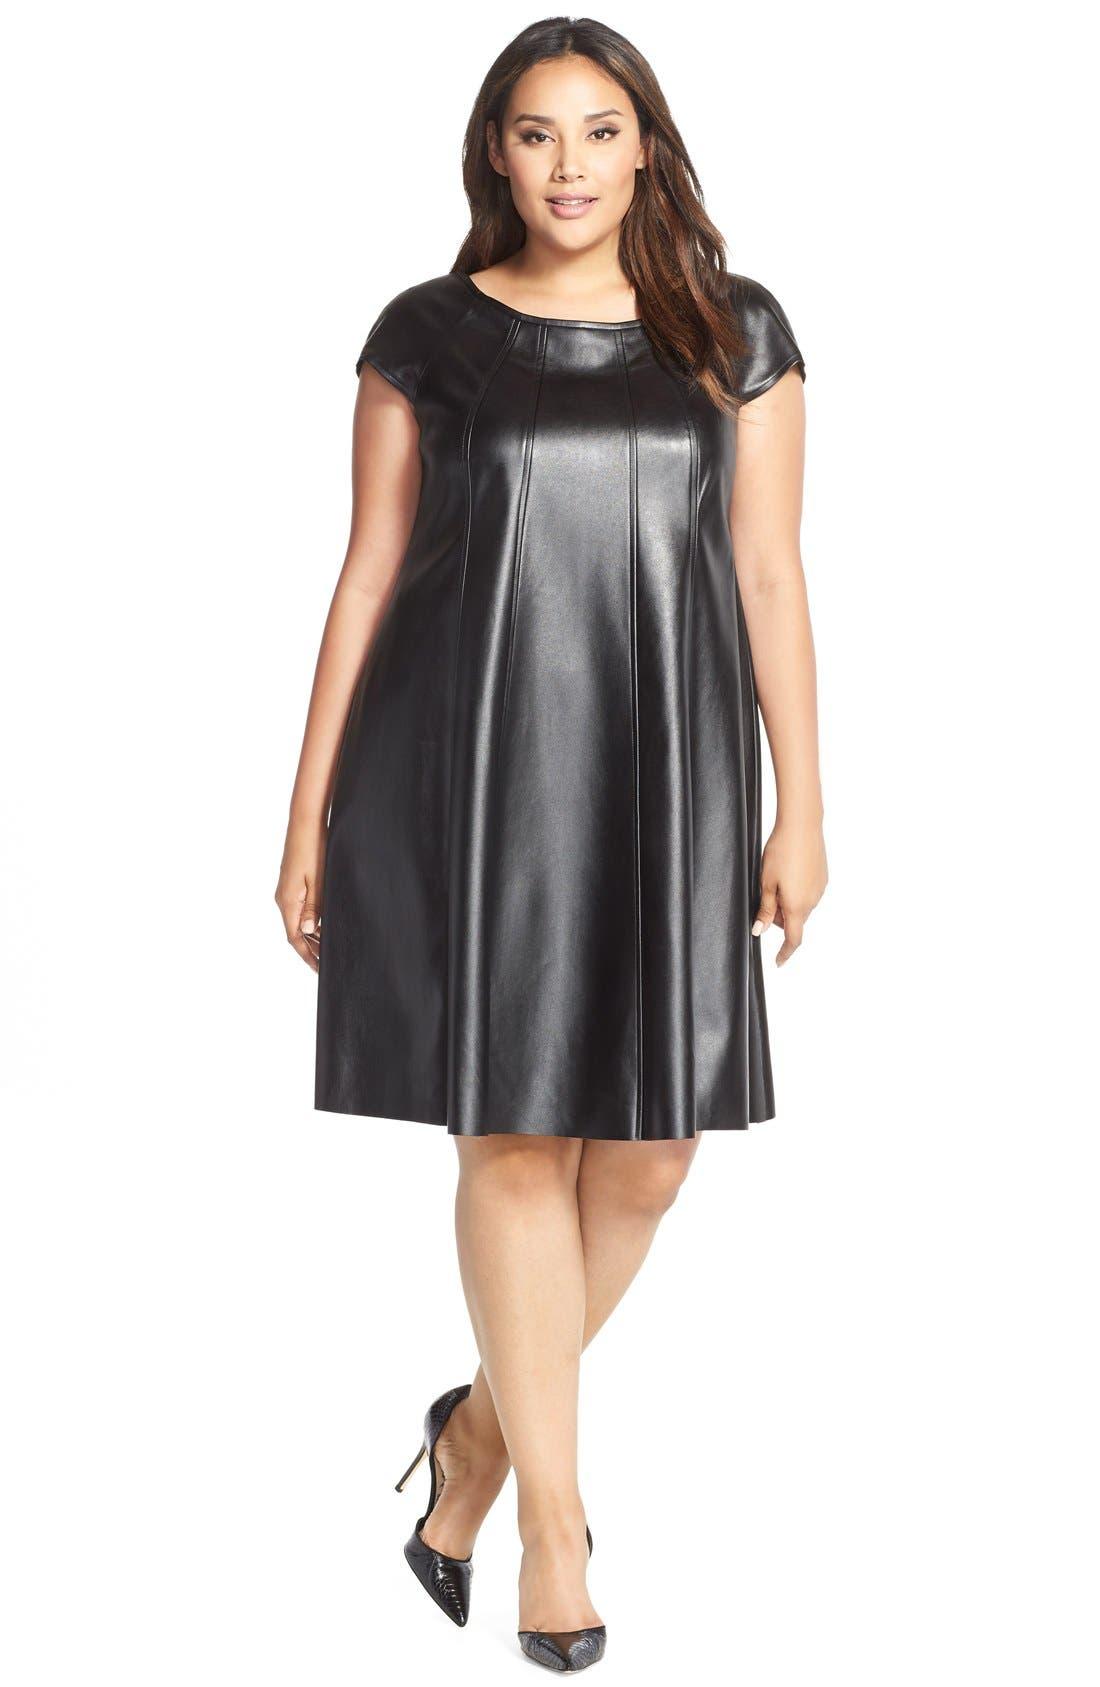 Main Image - Gabby Skye FauxLeather Trapeze Dress (Plus Size)